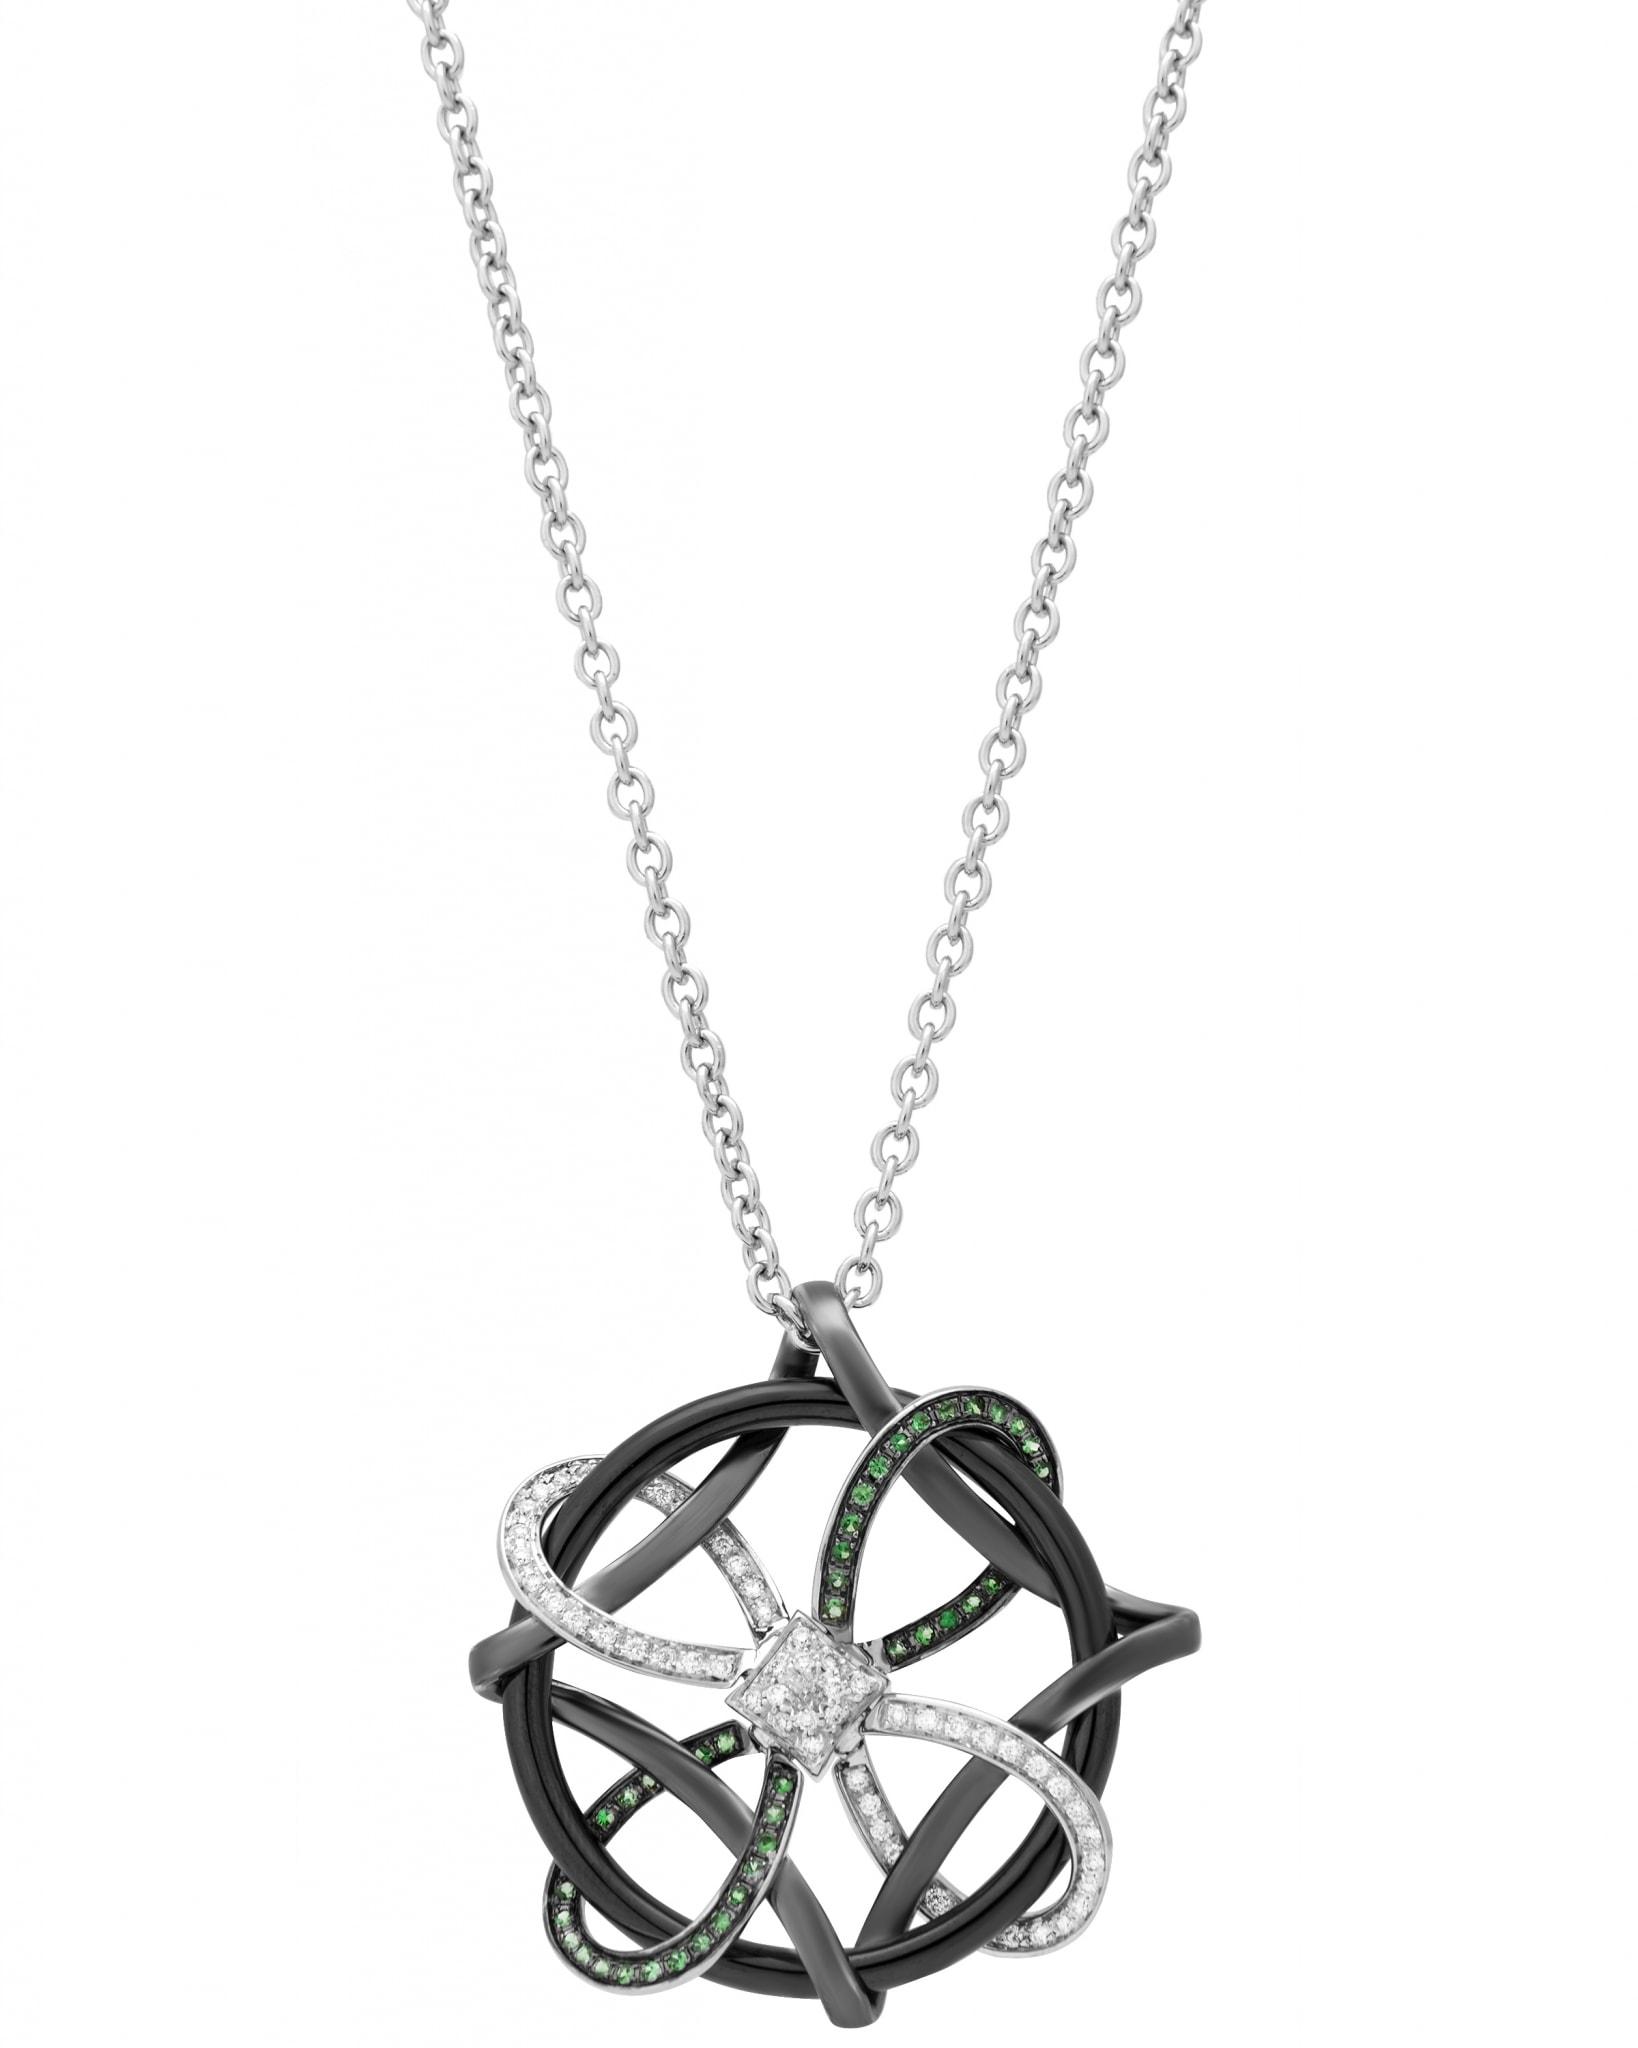 GIANNI LAZZARO -18K White Gold, and Ceramic, Diamonds, & Tsavorite, Necklace